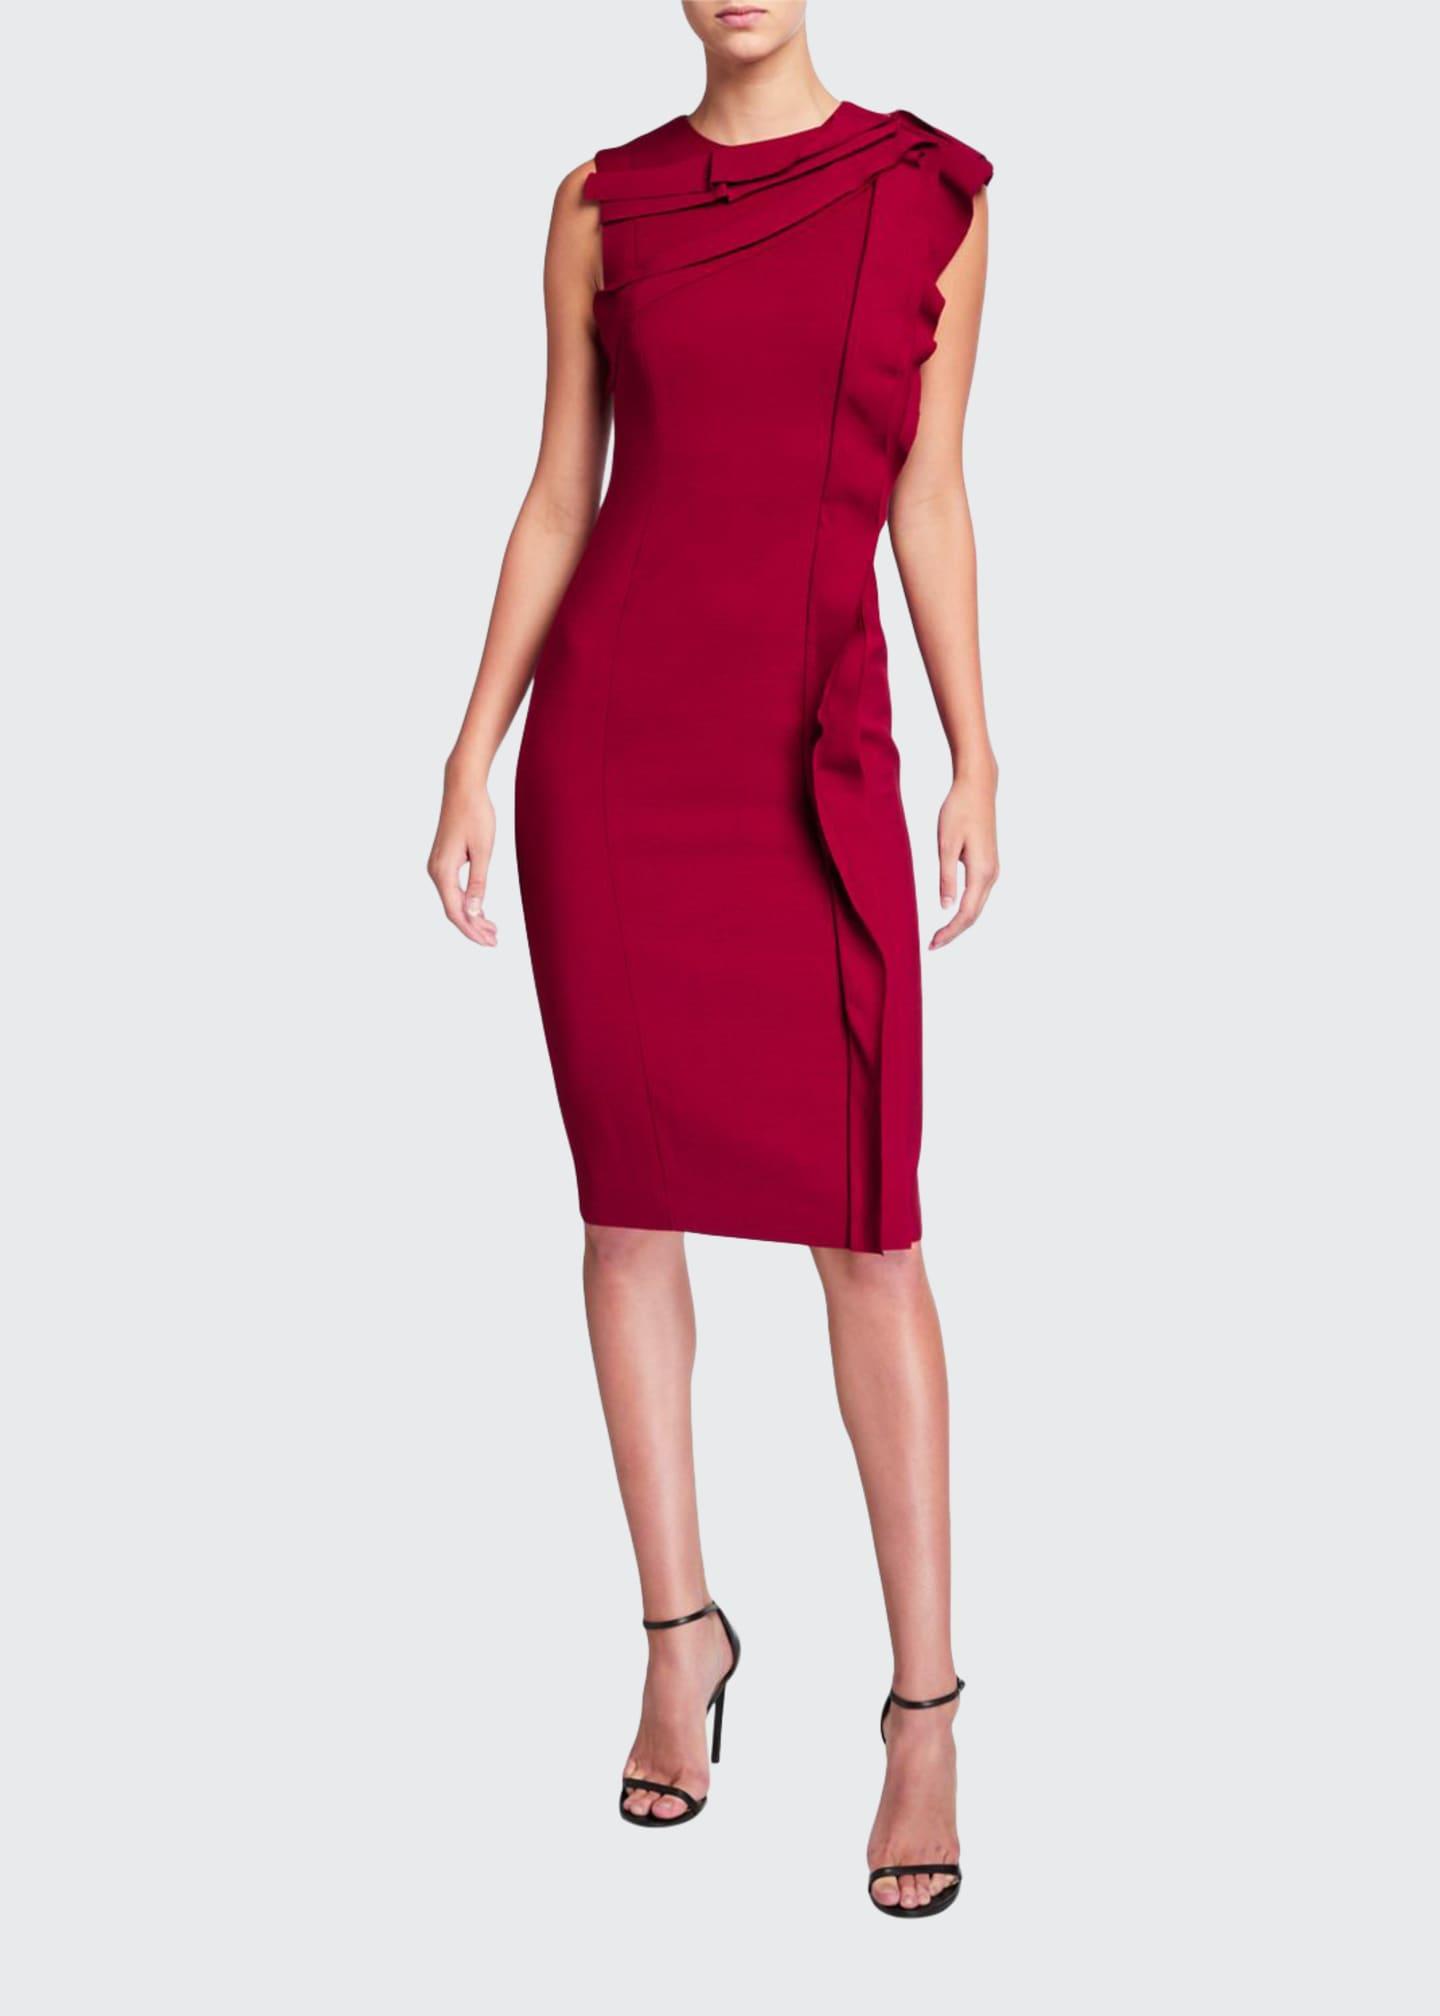 Jason Wu Collection Stretch Crepe Ruffled Day Dress